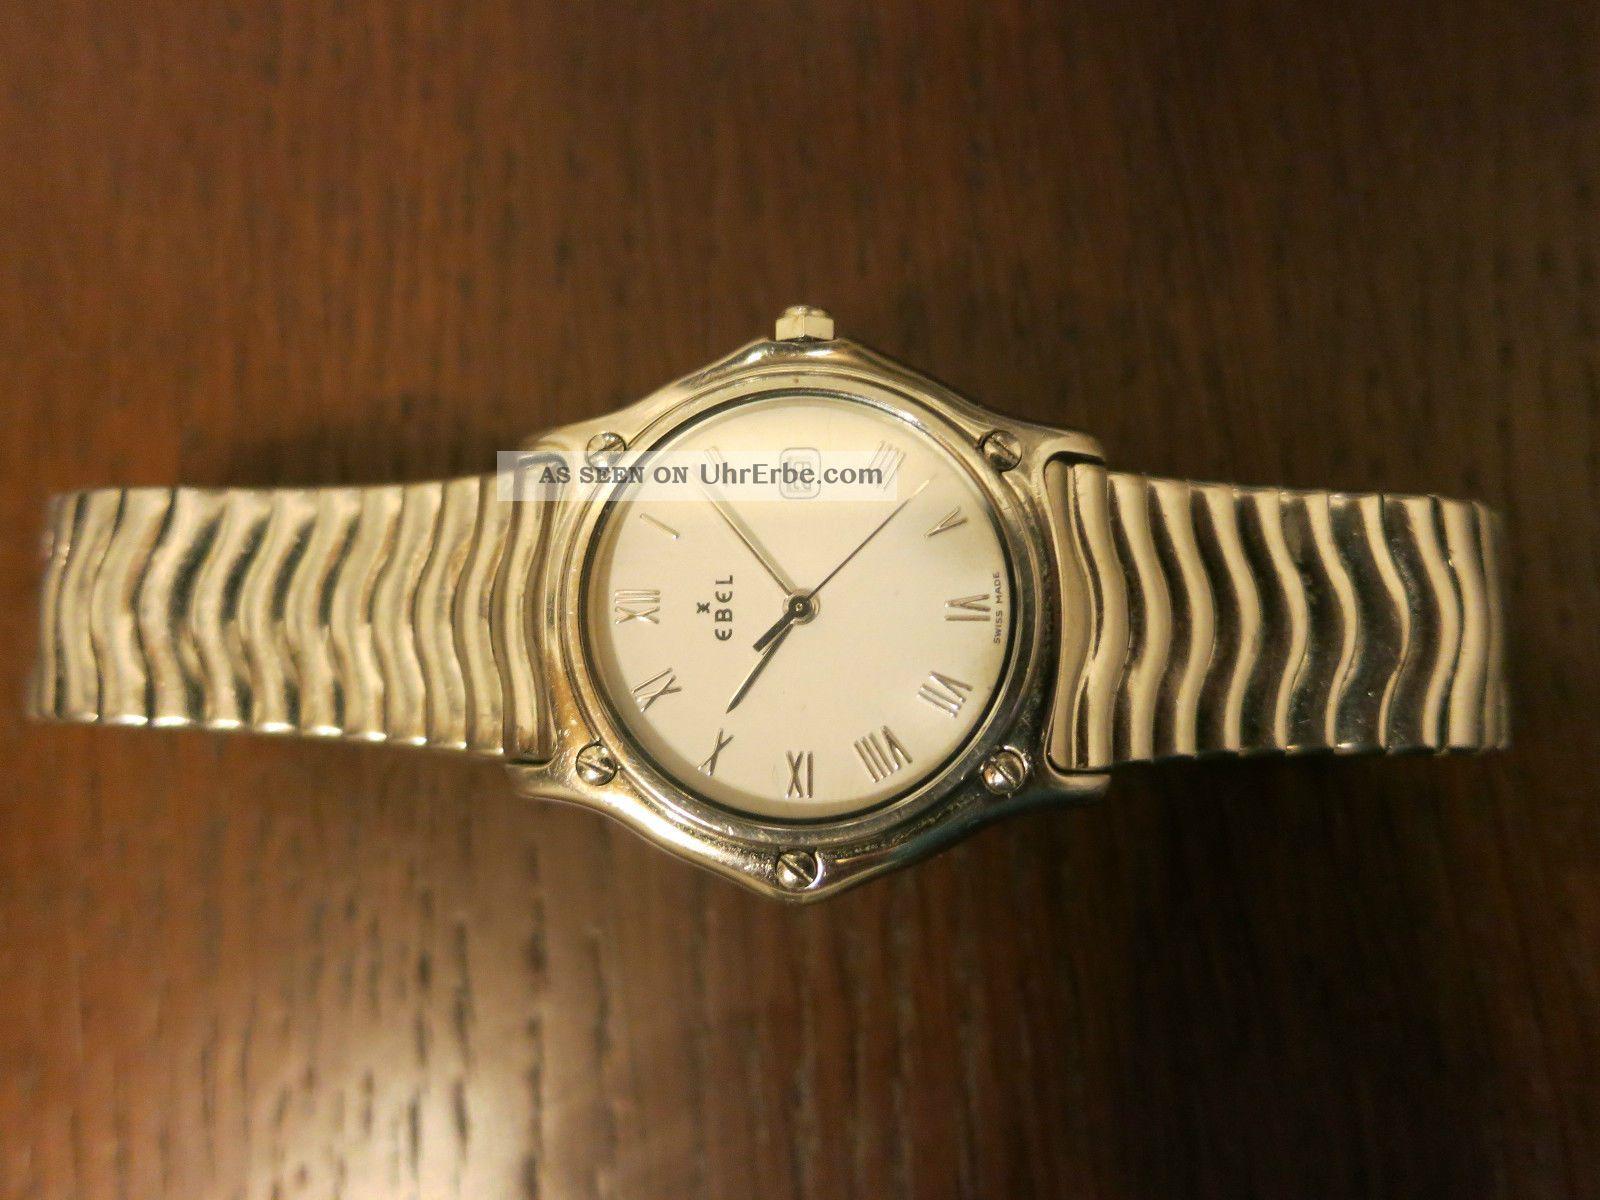 Ebel Sport Classic Wave Watch Uhr 9087132 Armbanduhren Bild